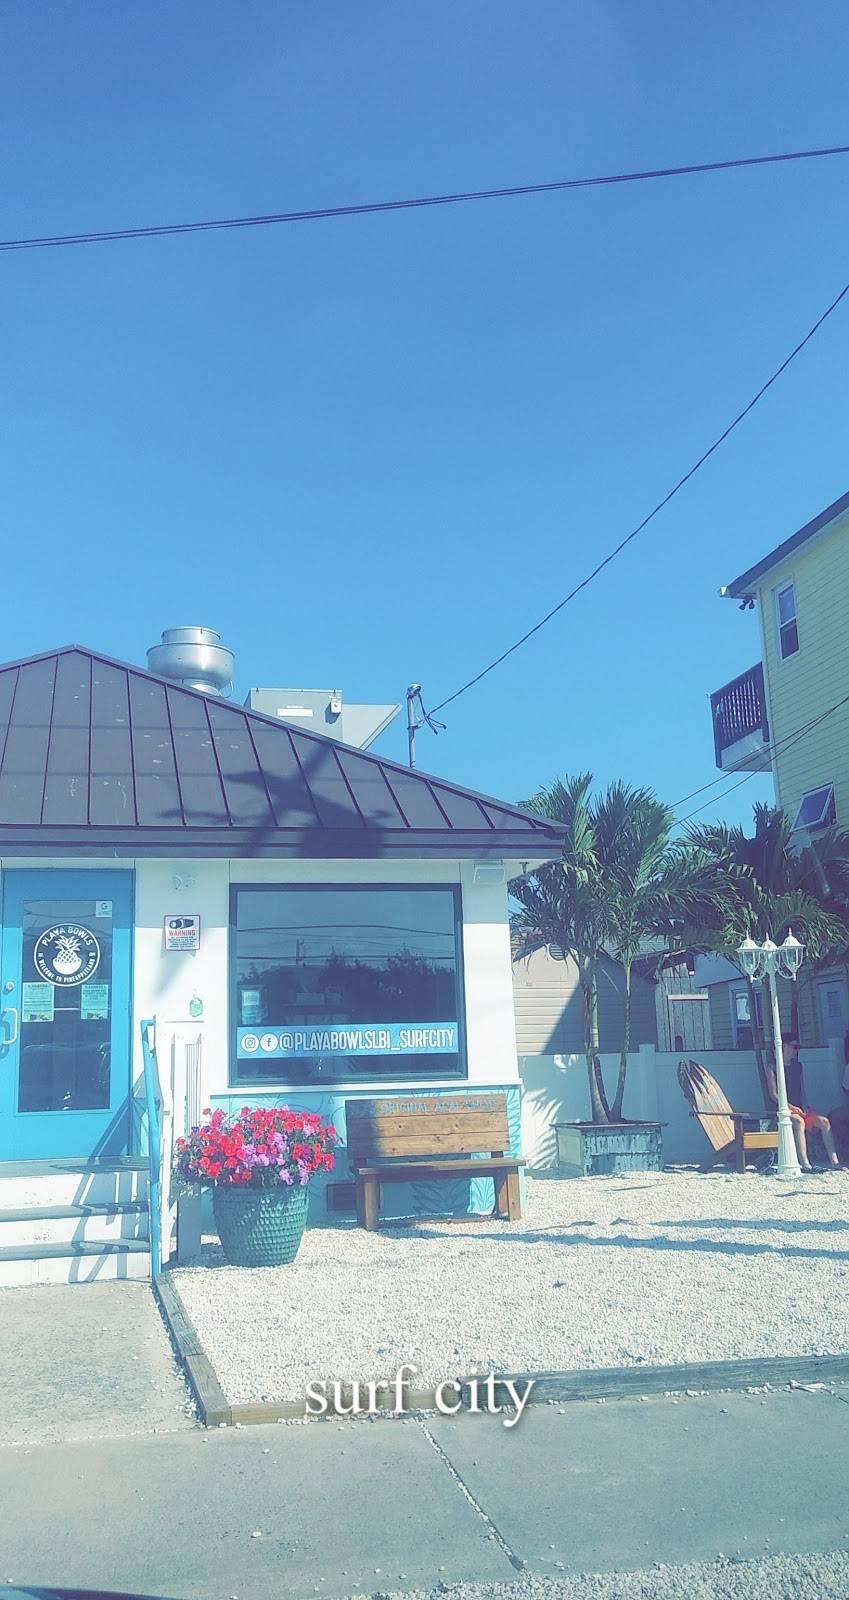 Playa Bowls | restaurant | 518 Long Beach Blvd, Surf City, NJ 08008, USA | 6093421908 OR +1 609-342-1908